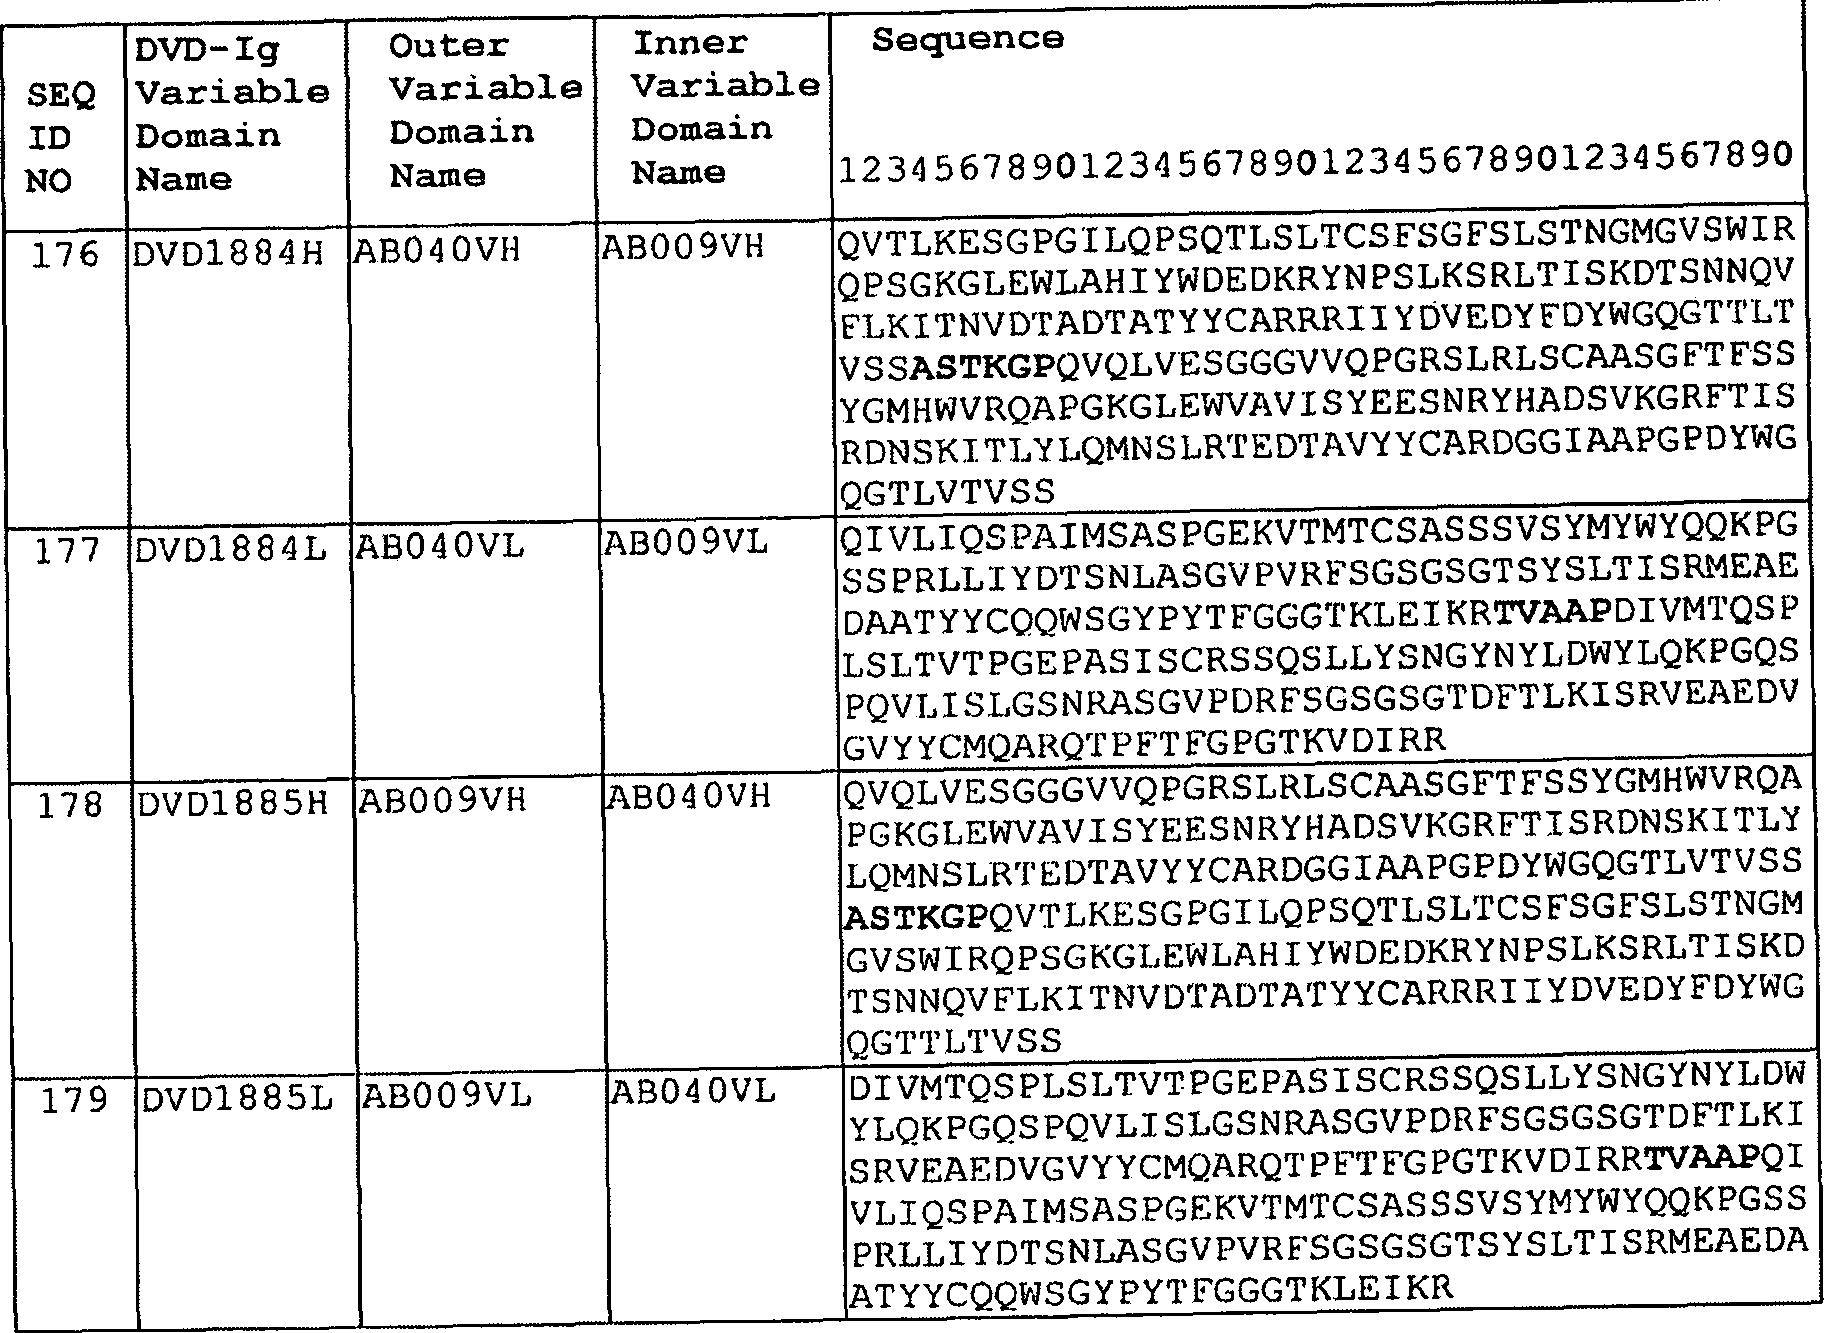 WO A2 Dual variable domain immunoglobulins and uses